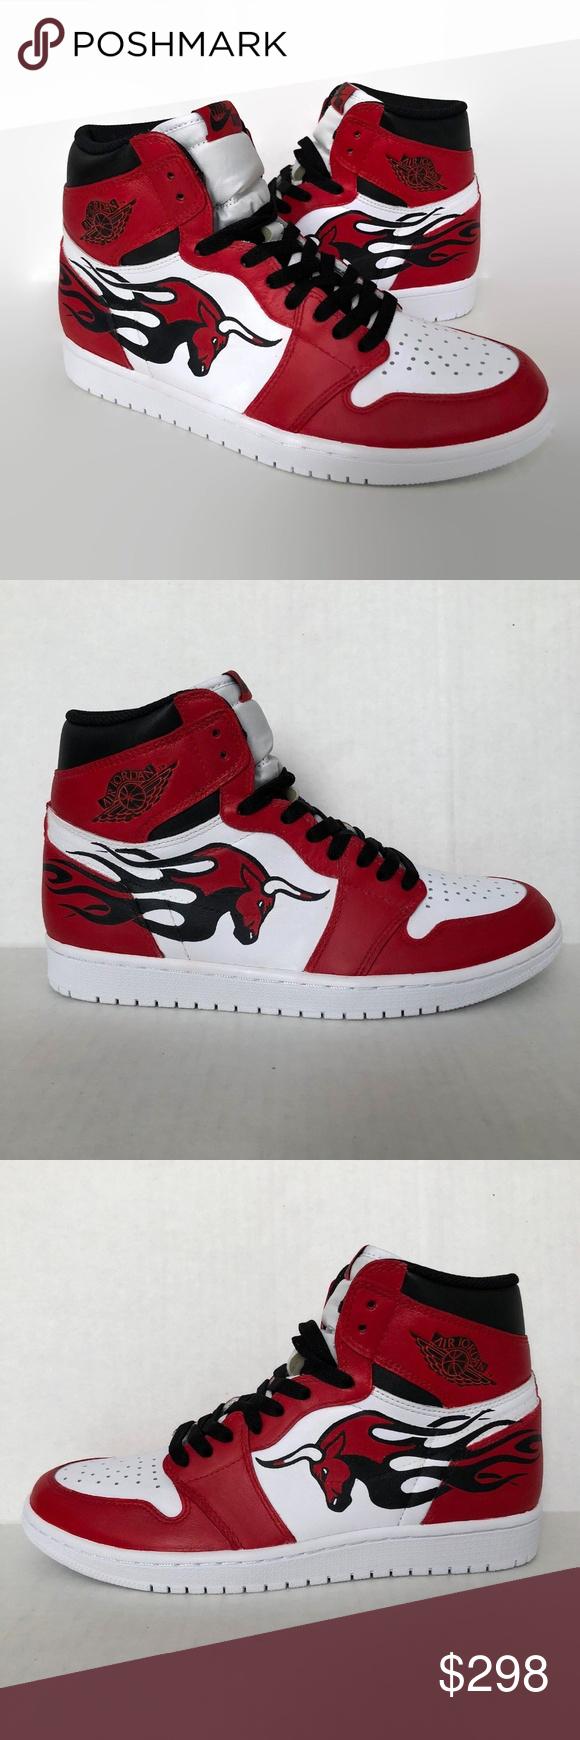 22bce9887d20 Air Jordan 1 Retro High Customs Chicago Bulls Air Jordan 1 Retro High Men s  Size 9